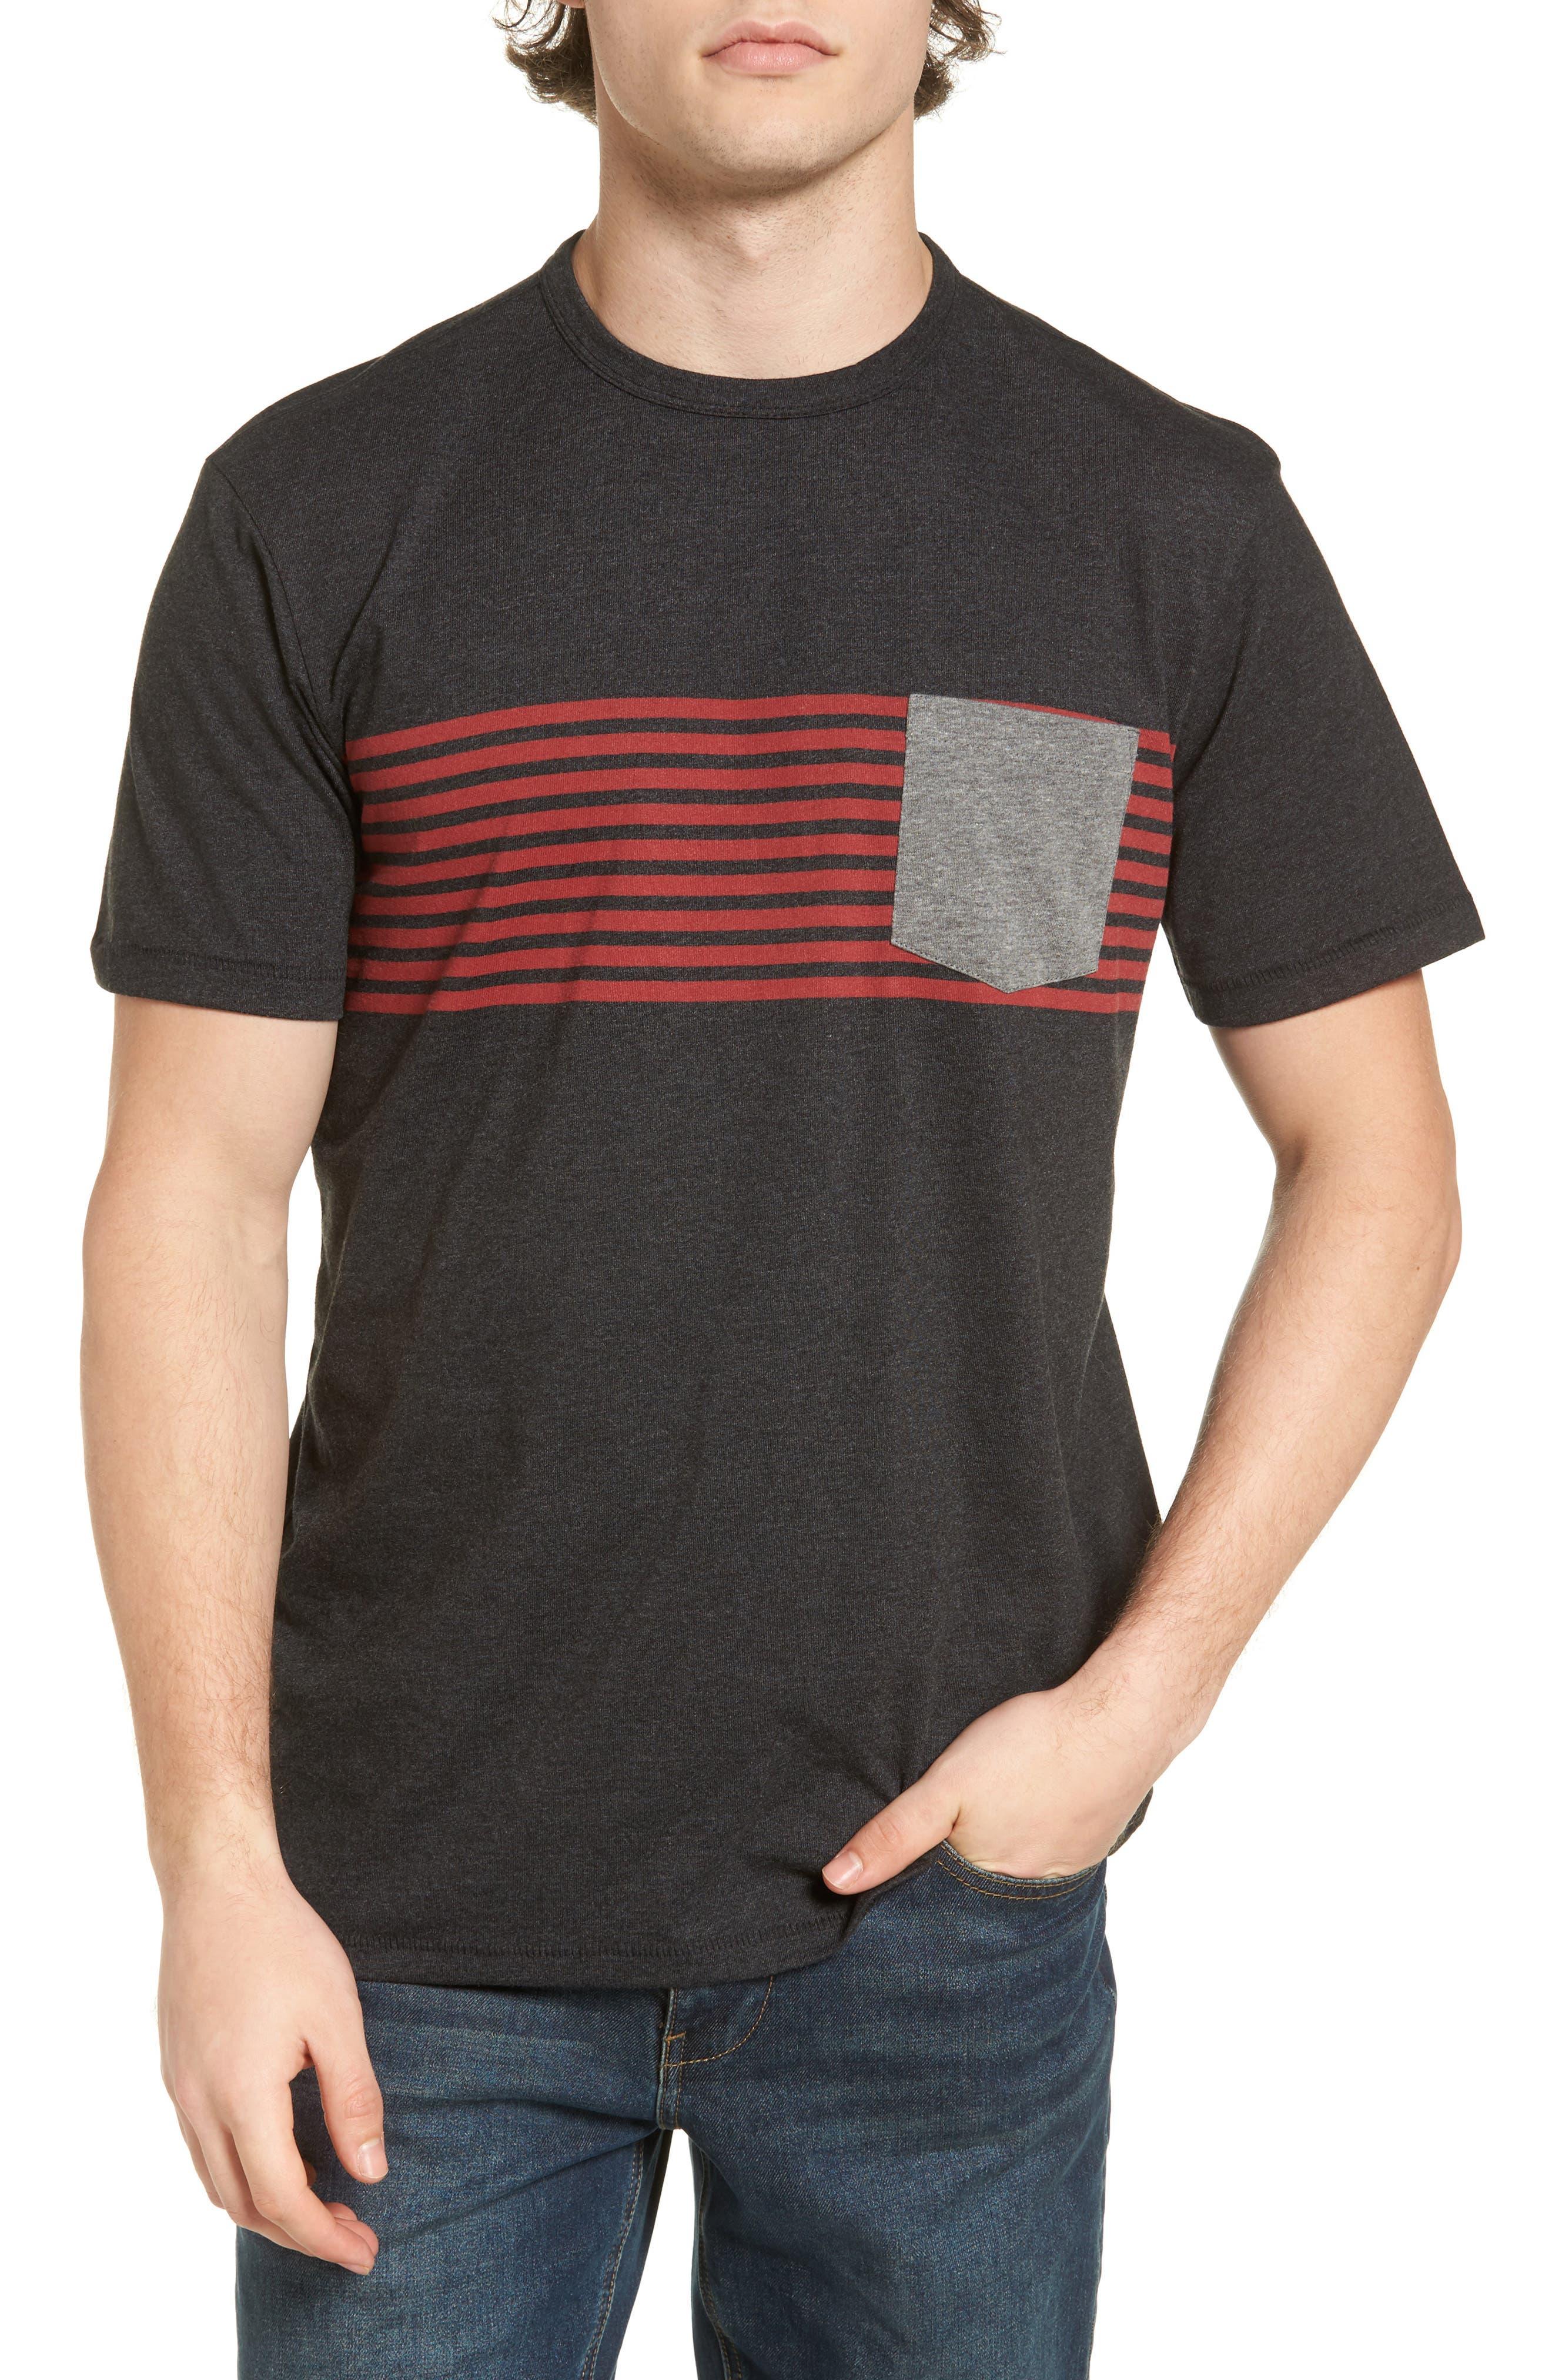 Rodgers Striped Pocket T-Shirt,                             Main thumbnail 1, color,                             001